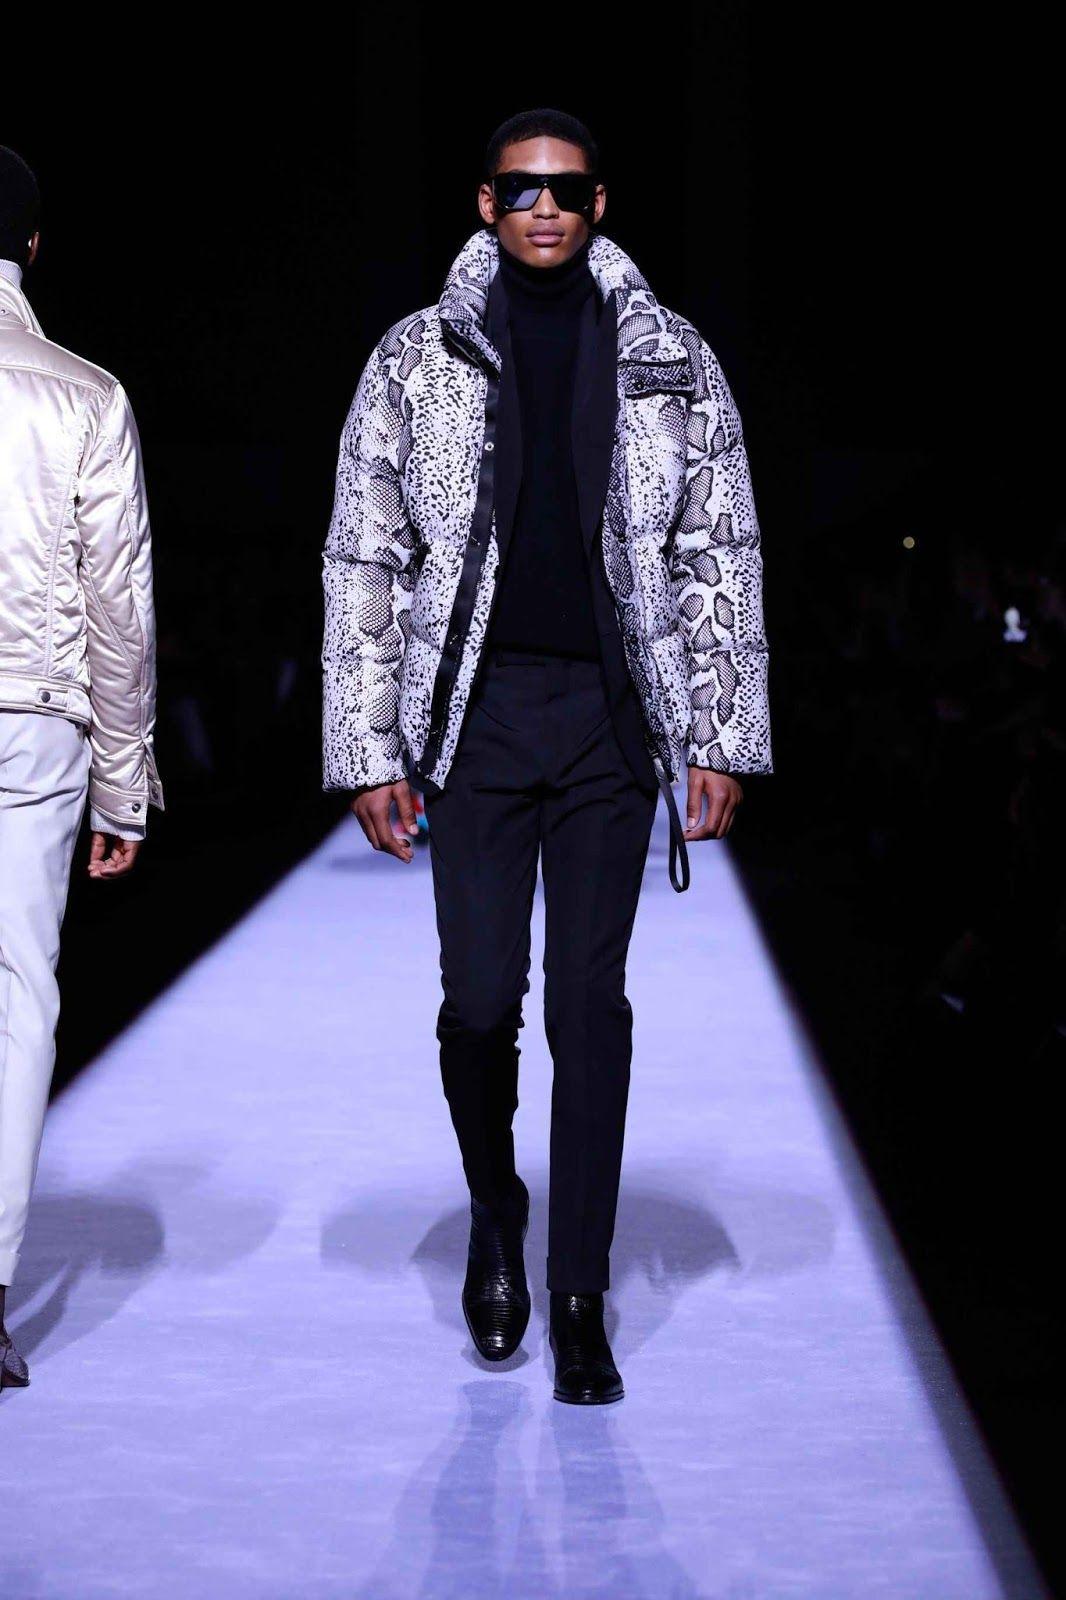 cb779db6f8 Tom Ford Fall-Winter 2018-2019 - New York Fashion Week